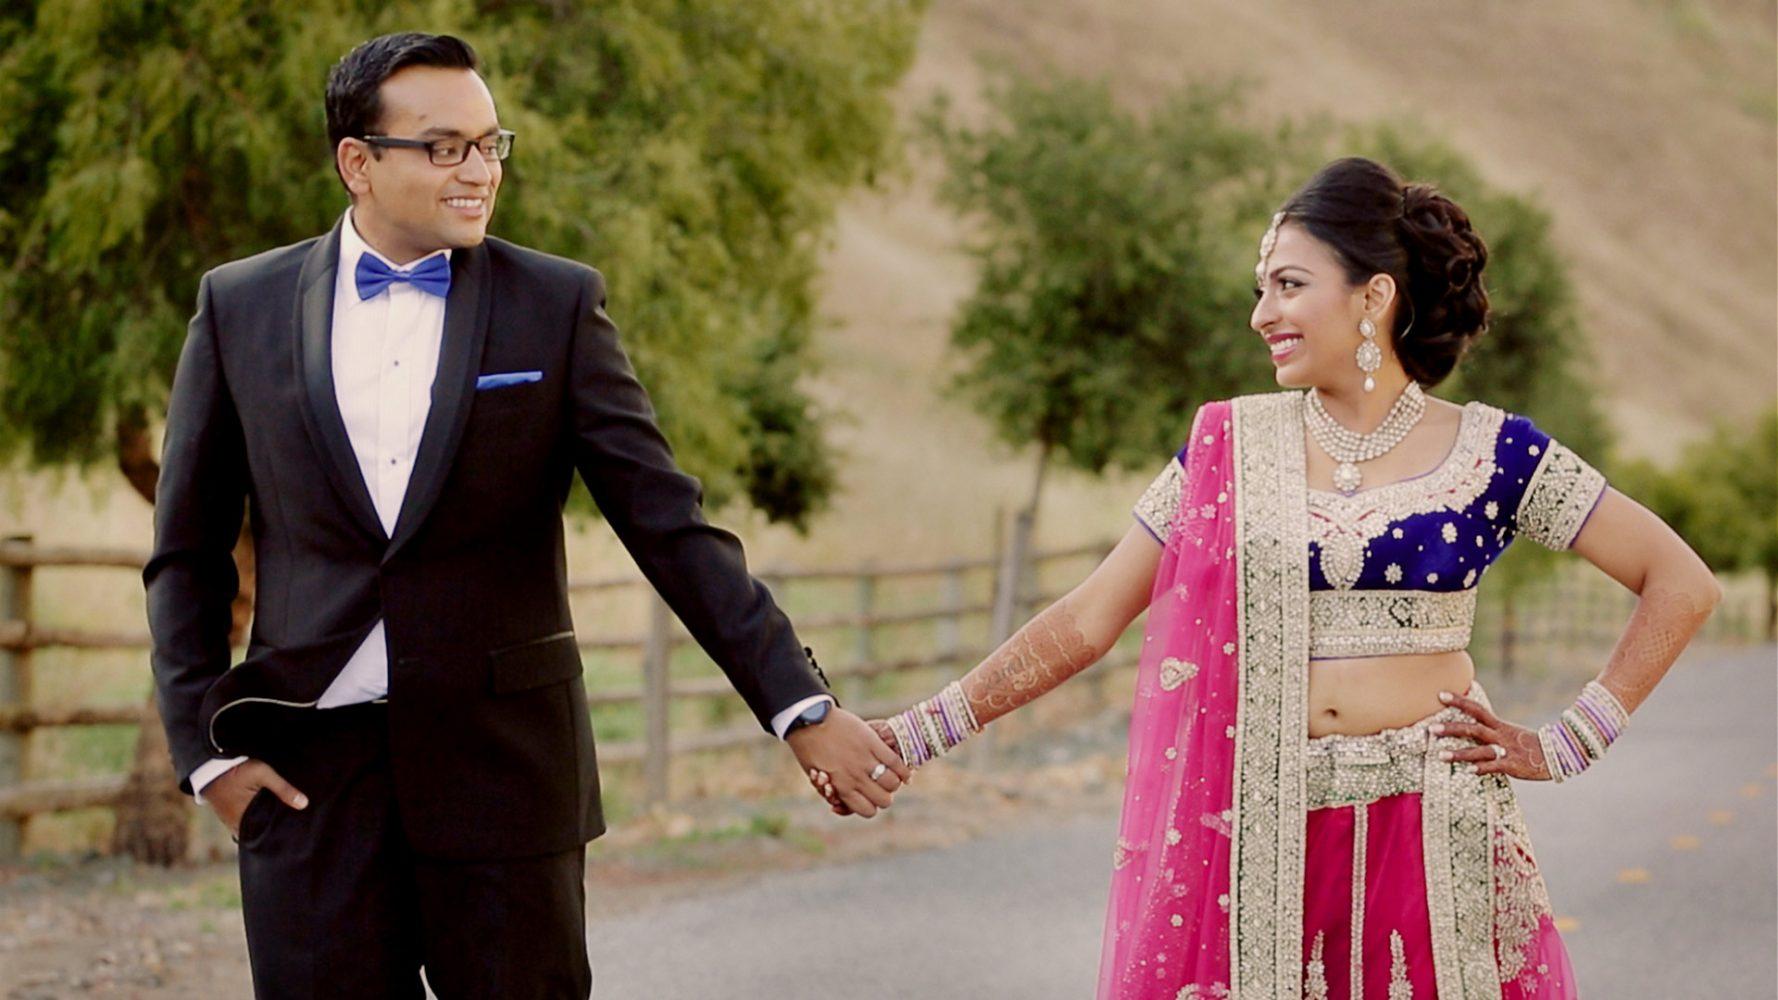 Umang + Shivani | Sunol, California | Nella Terra Cellars